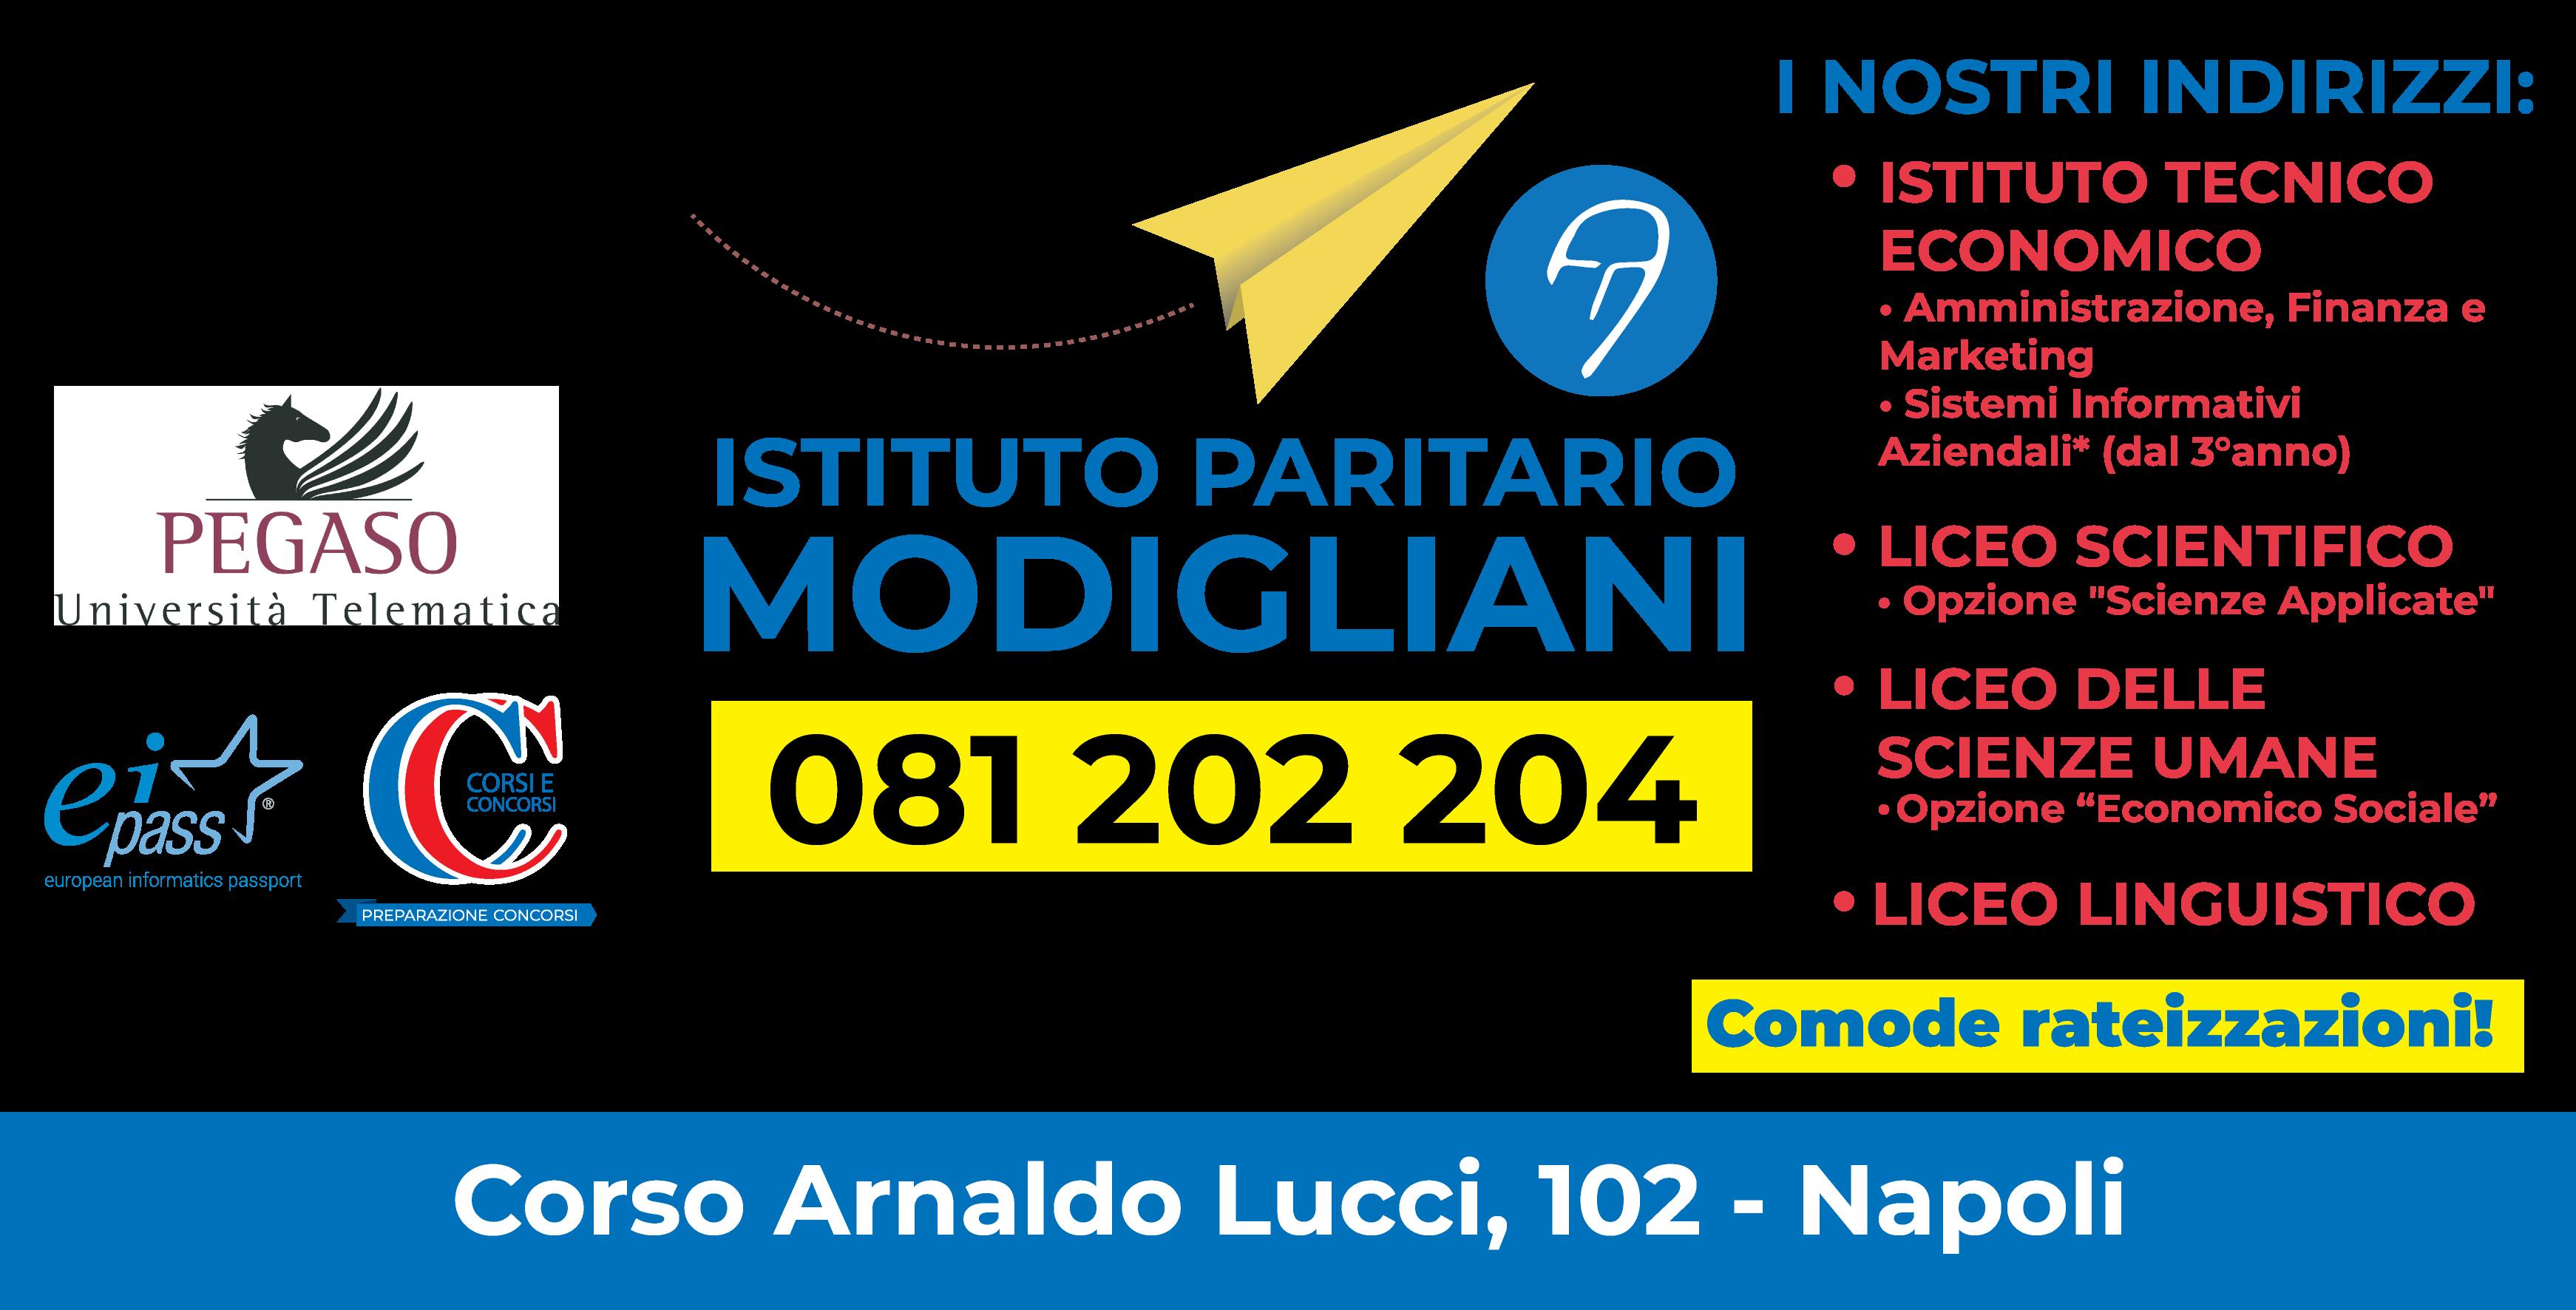 590-x-290-modigliani-2021-01